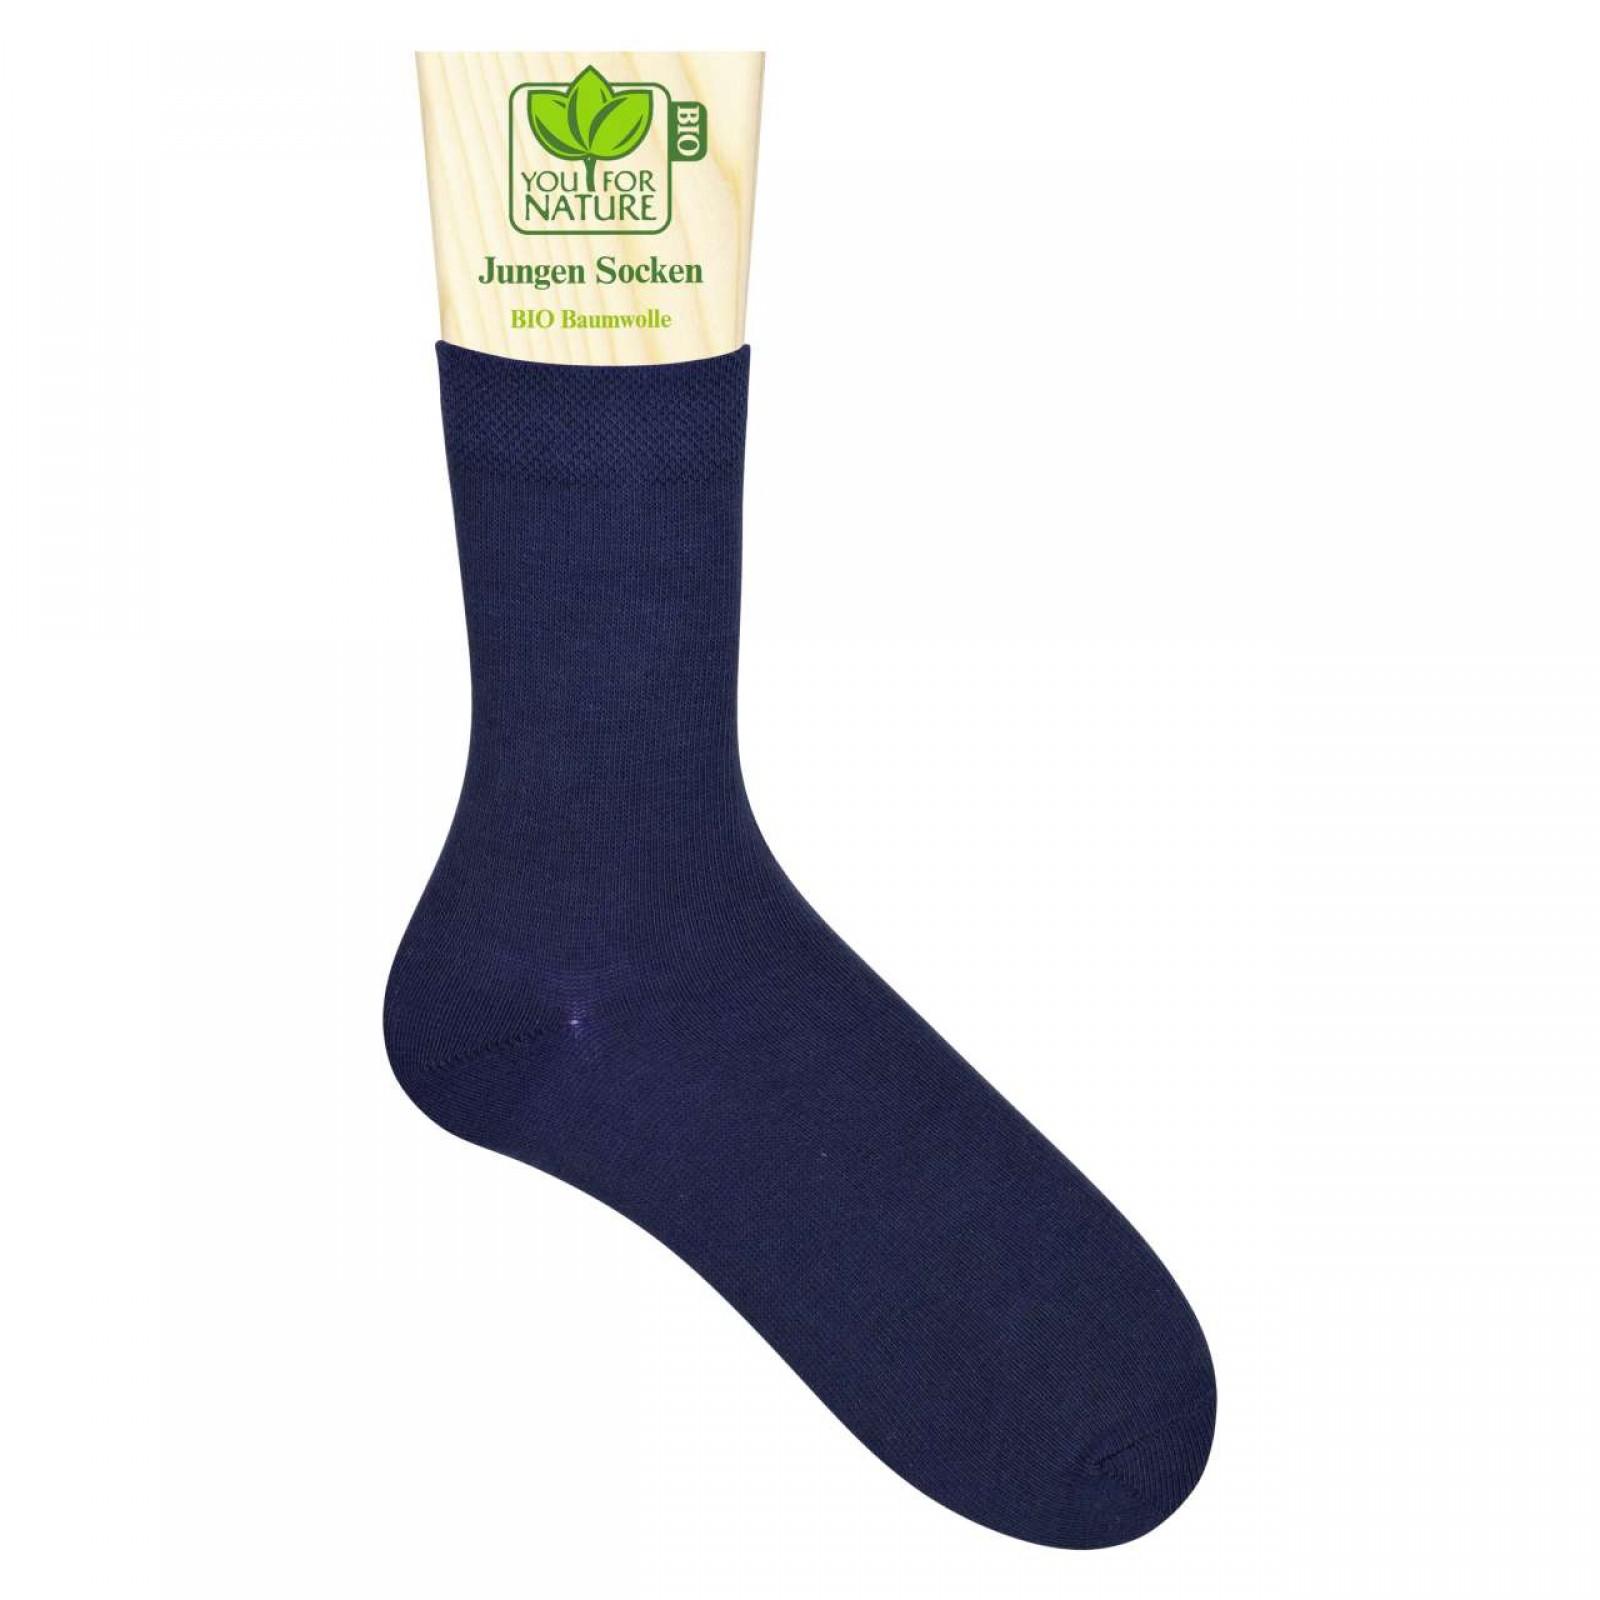 Jungen Socken/Strümpfe BIO Baumwolle | Kinder | YOU FOR NATURE